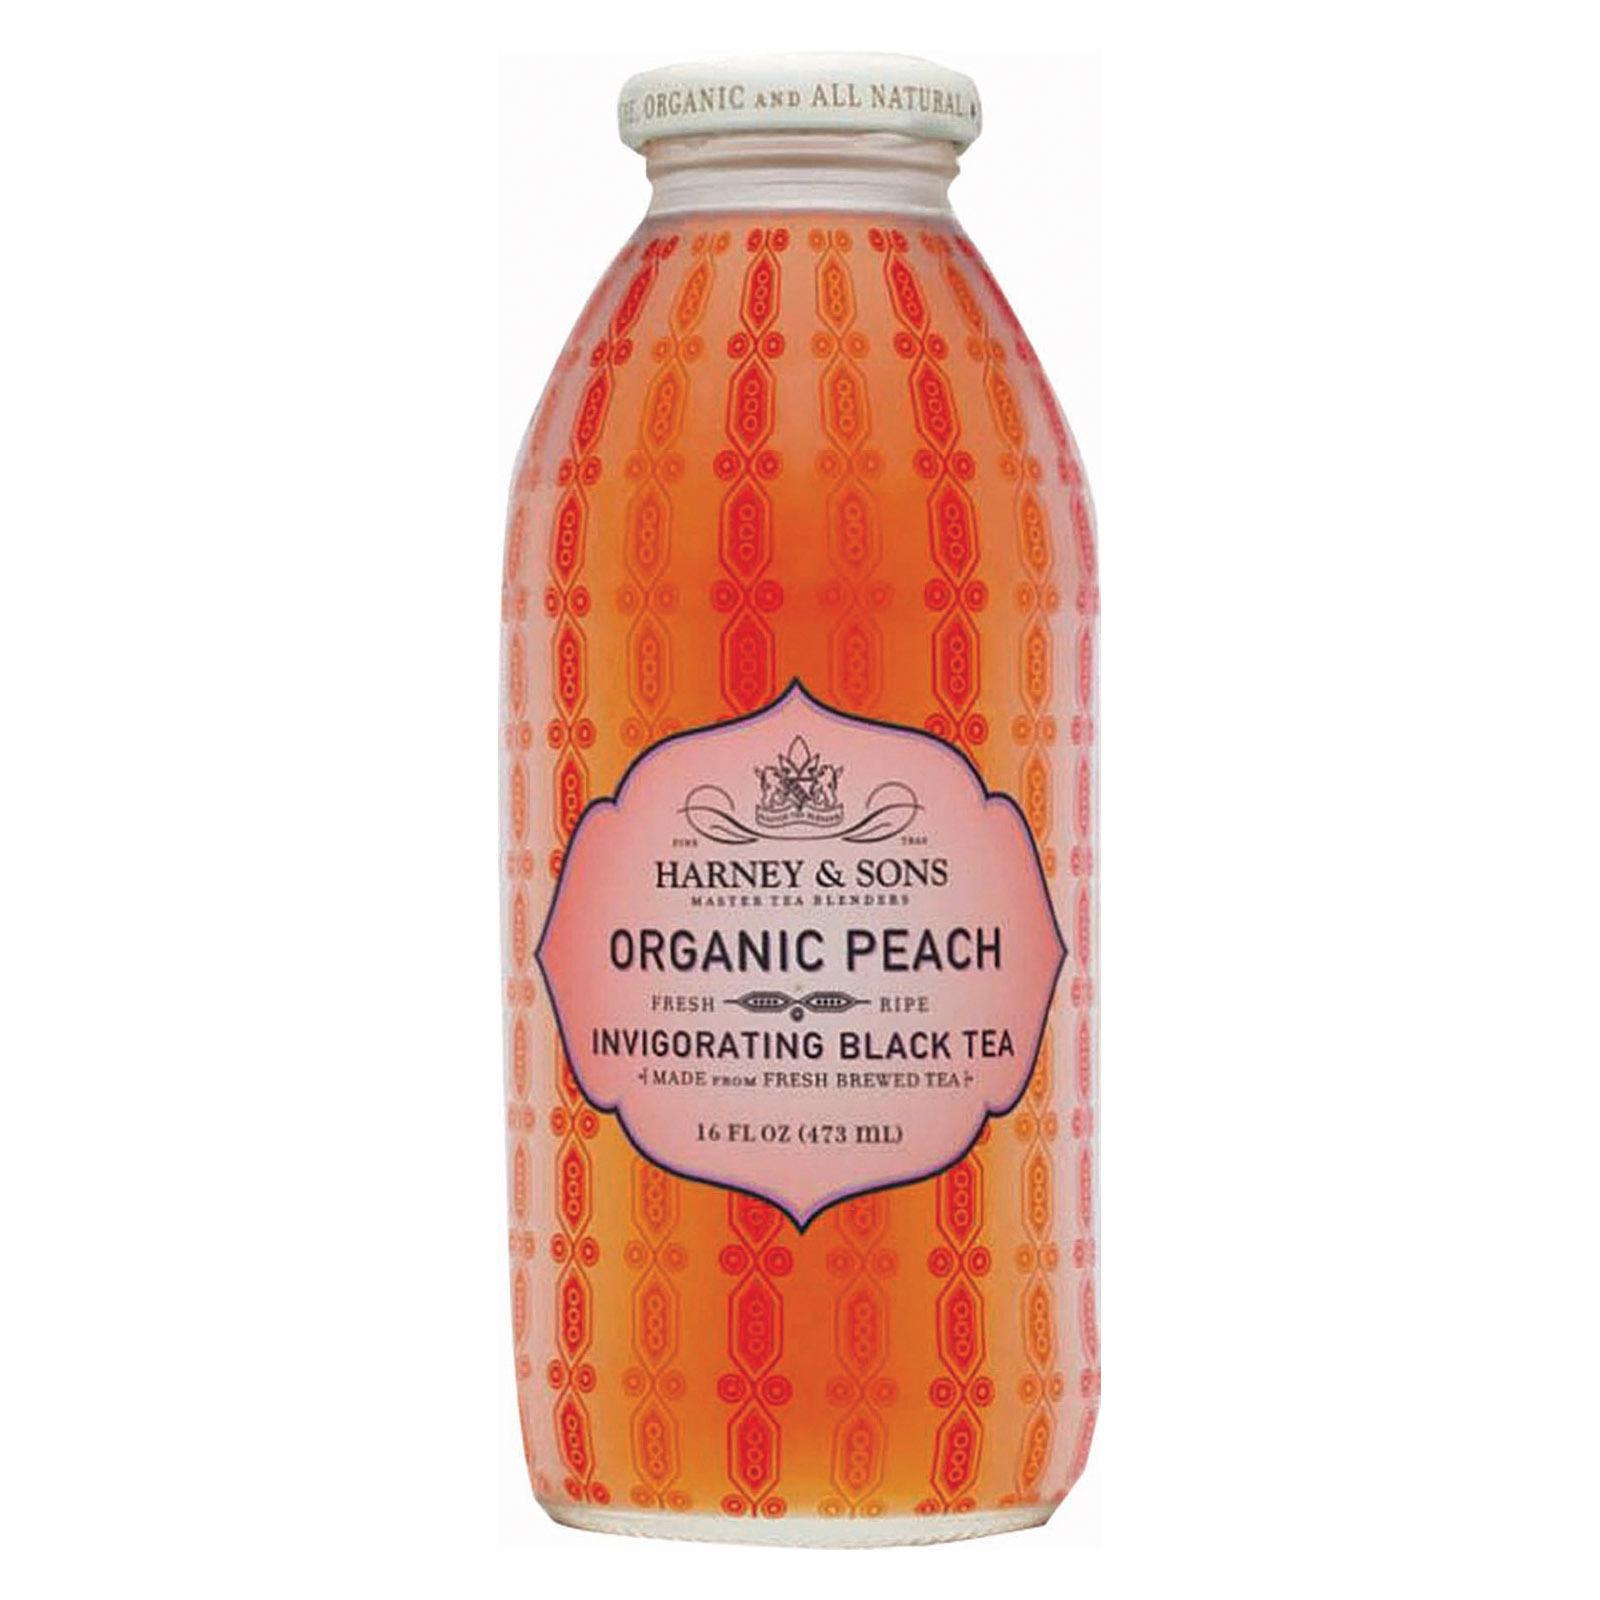 Harney and Sons Harney and Sons Organic Peach Tea - Iced Tea - Case of 12 - 16 Fl oz.